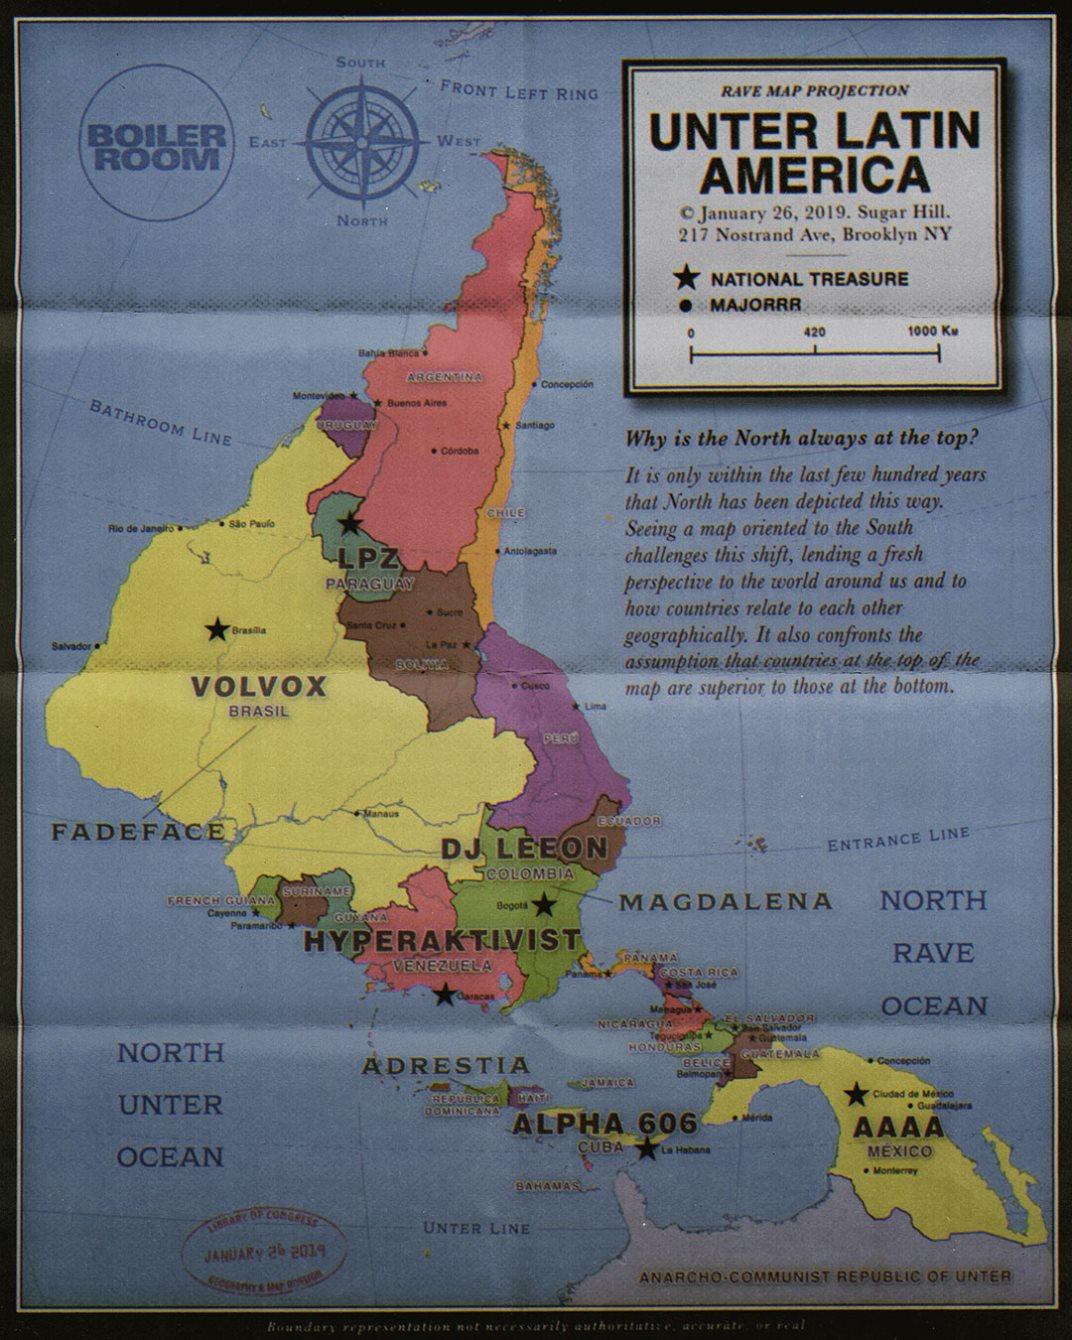 Unter Latin America x Boiler Room - Flyer front